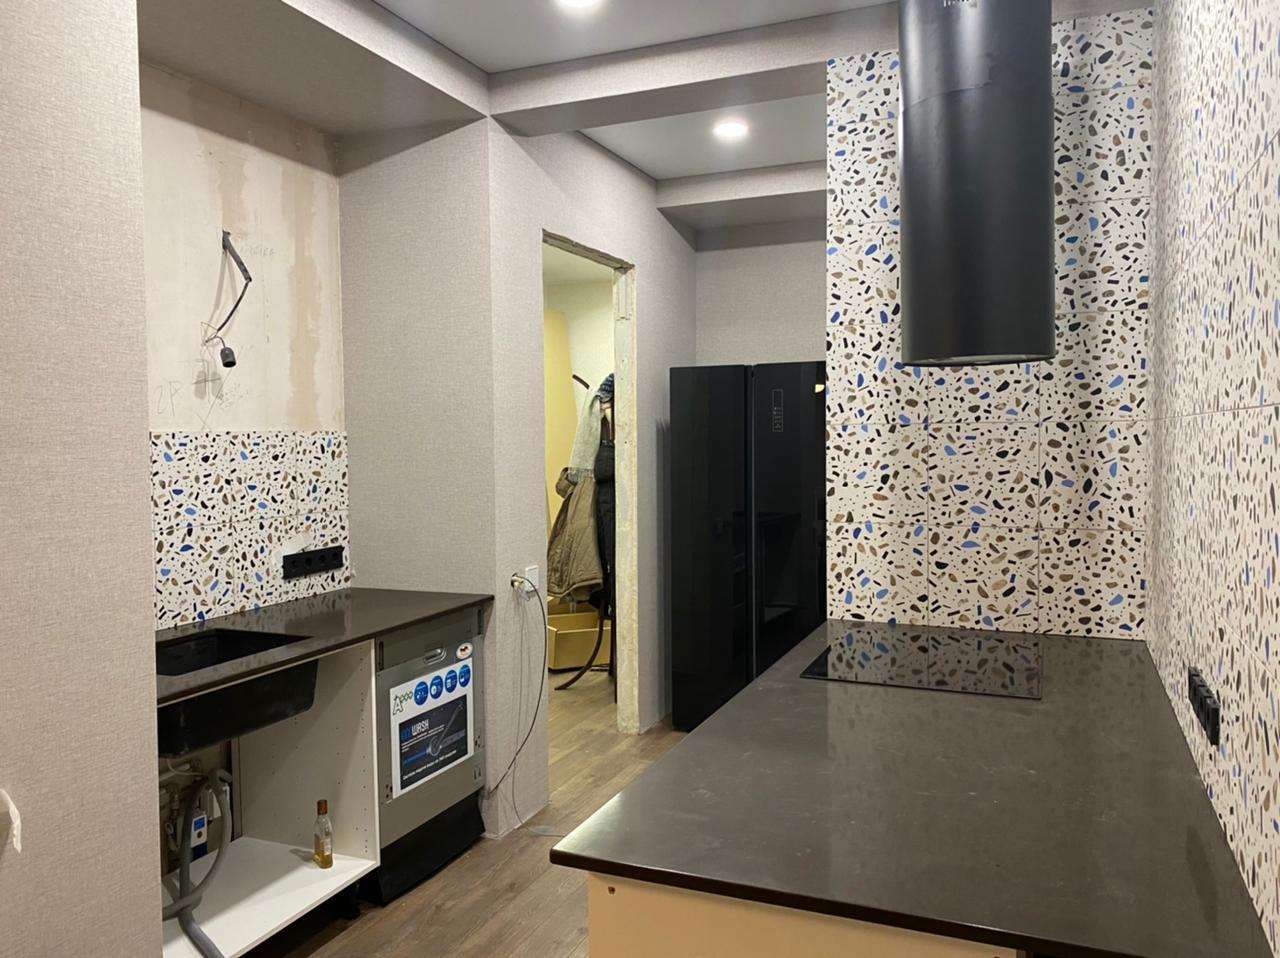 Столешница на кухню из кварцевого агломерата Technistone